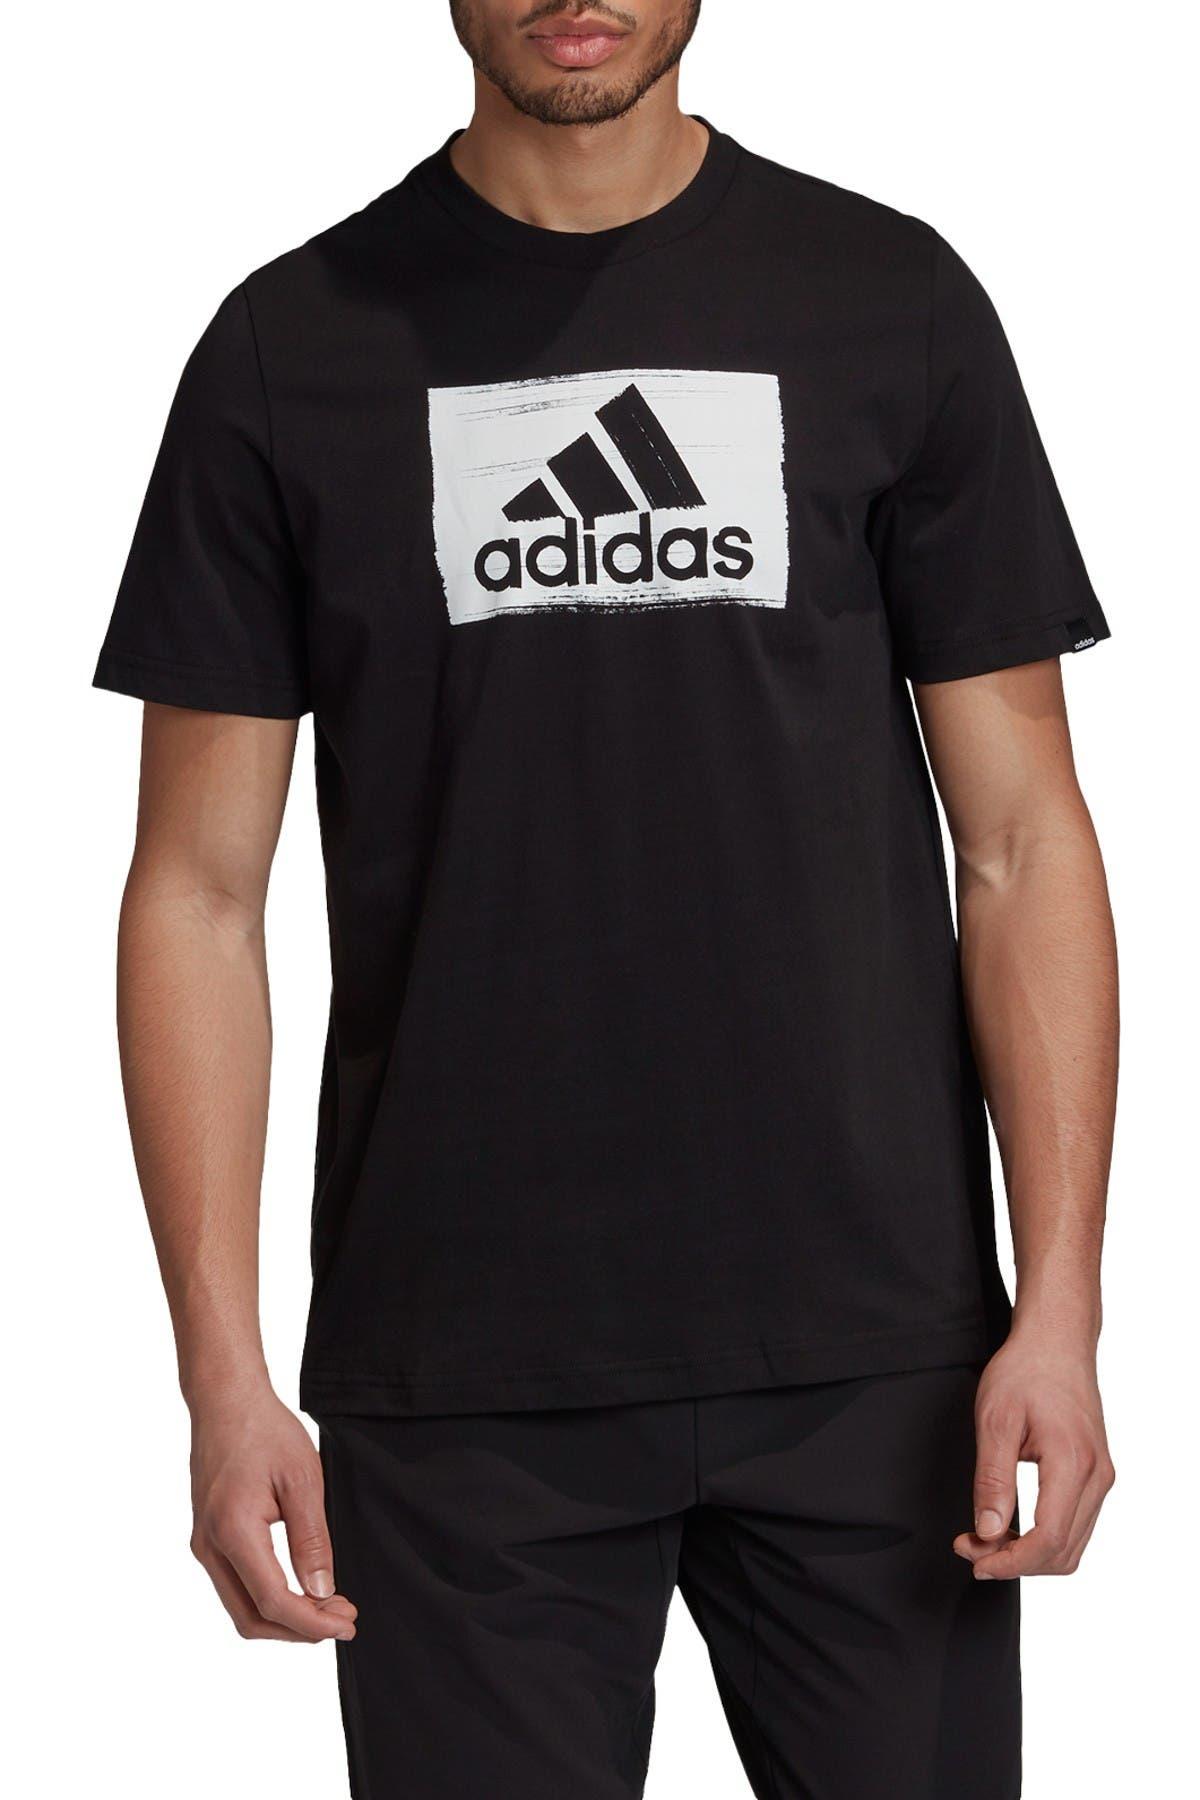 Image of adidas Brushstroke Logo T-Shirt